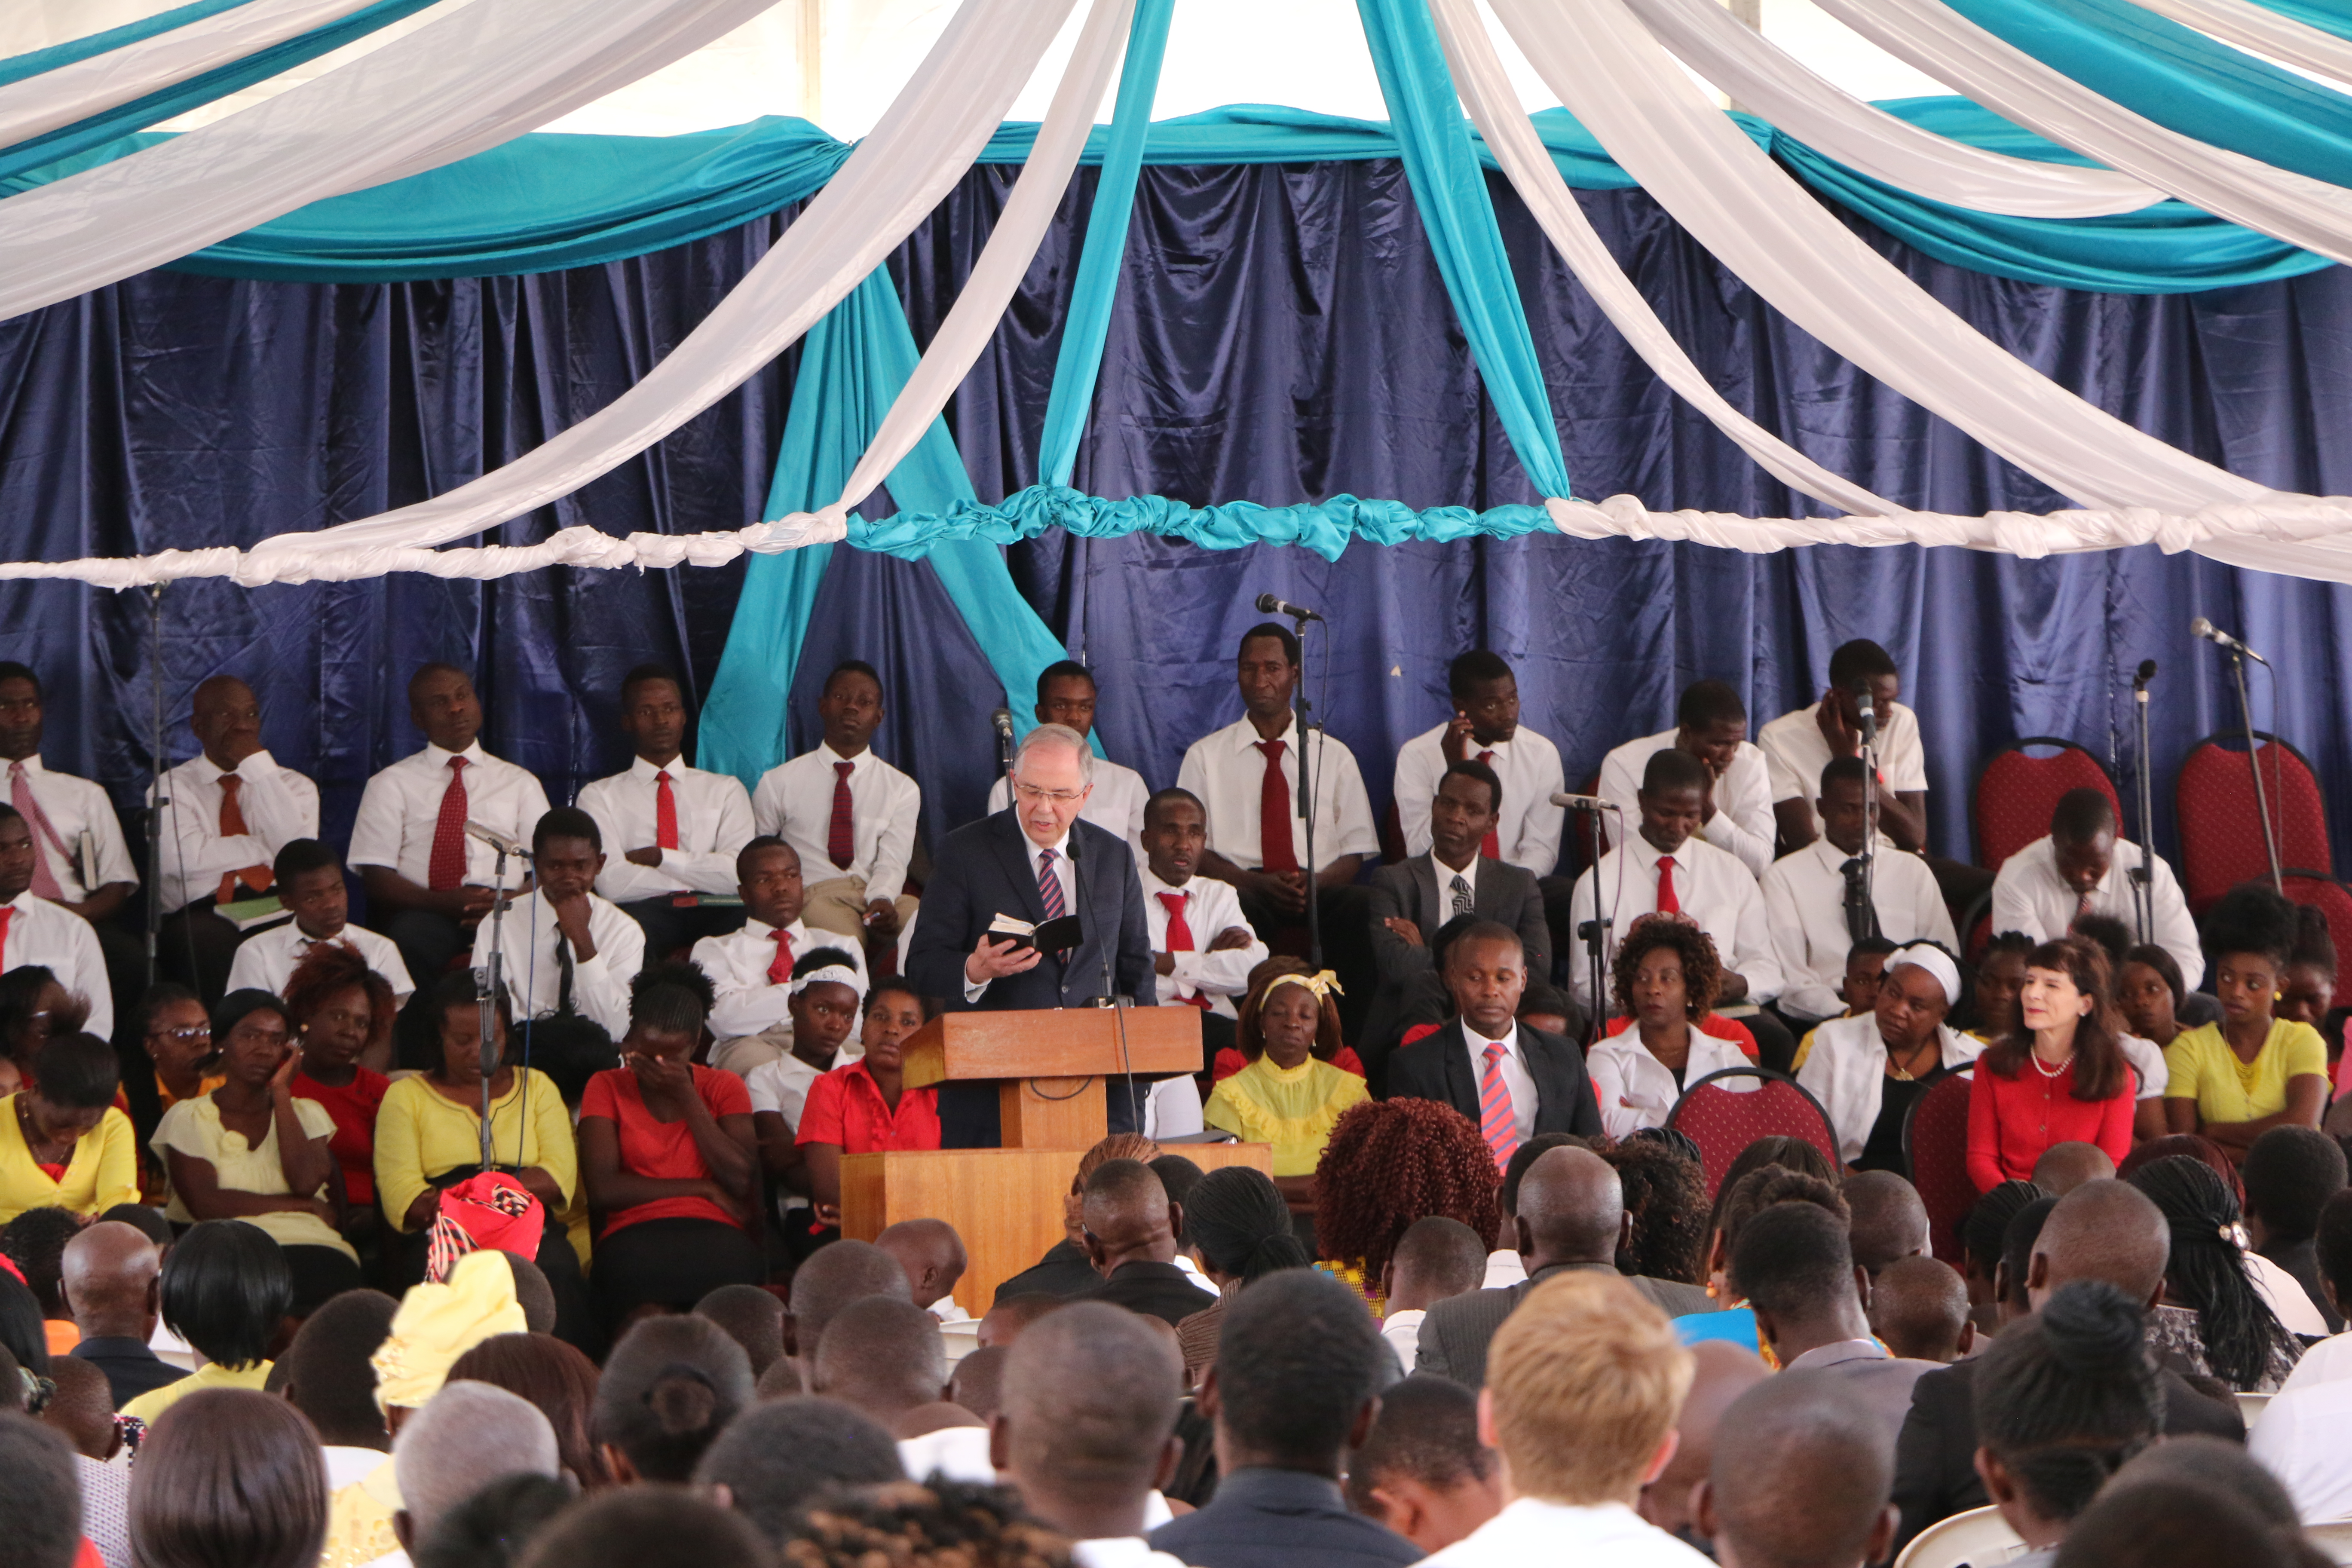 Elder Neil L. Andersen of the Quorum of the Twelve Apostles, center with Sister Kathy Andersen participate in a member meeting in Zimbabwe on Nov. 18. 2018.